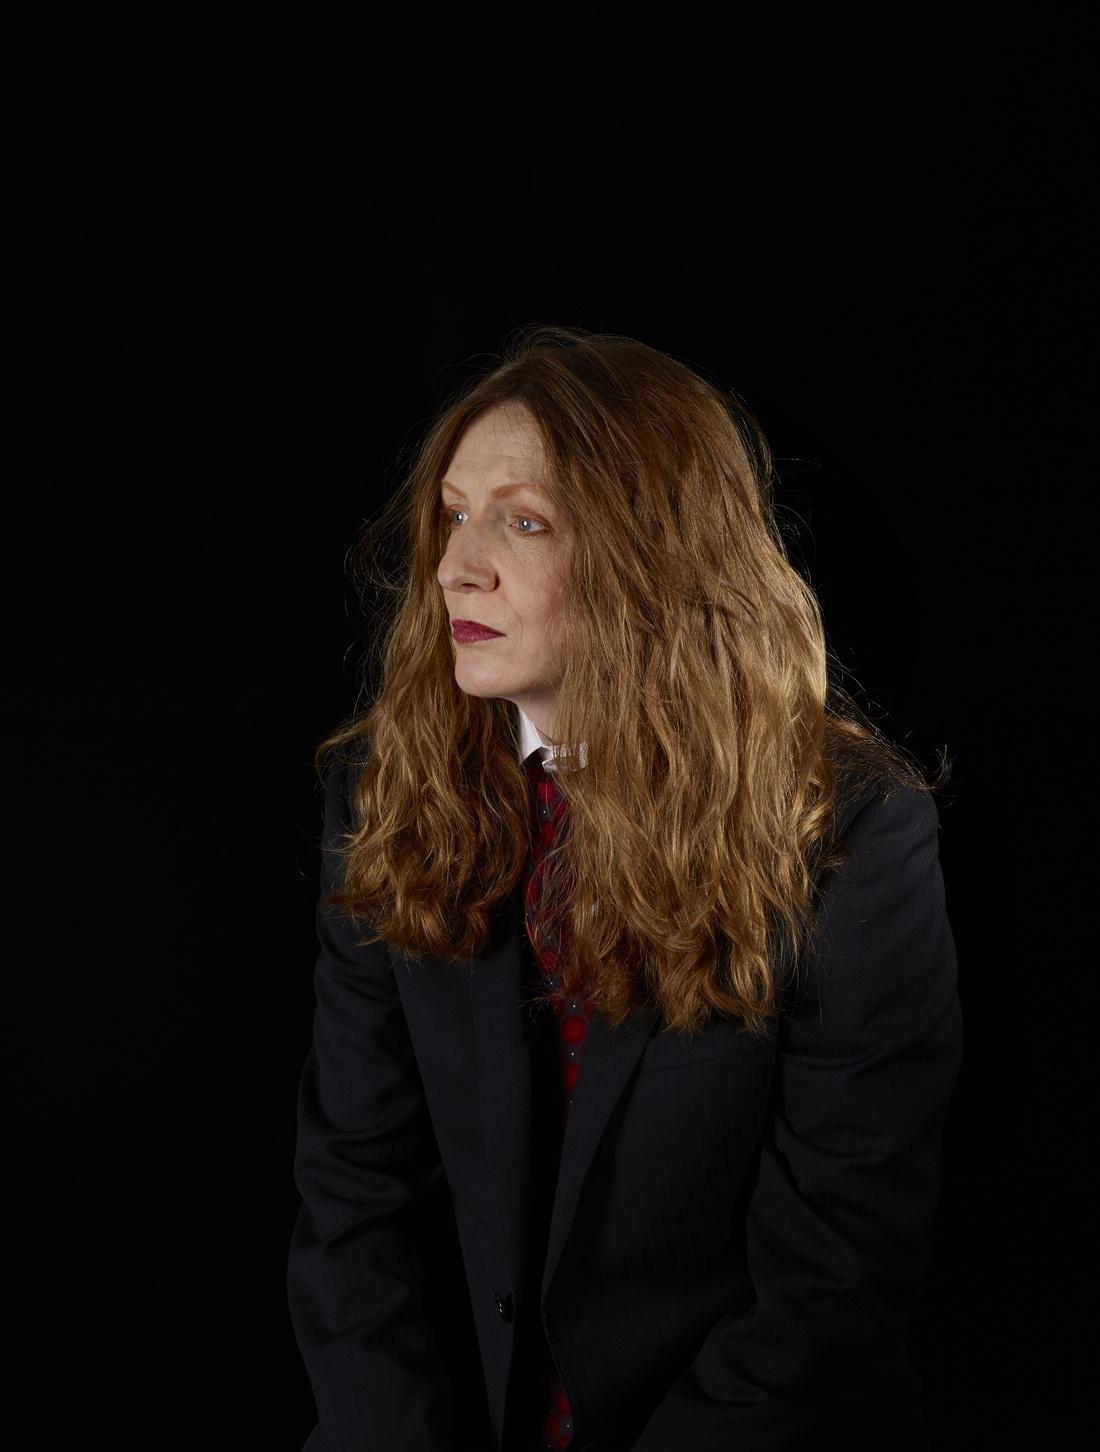 Catherine Opie, Nicola, 2014. © Catherine Opie. Courtesy of Regen Projects, Los Angeles and Thomas Dane Gallery, London.